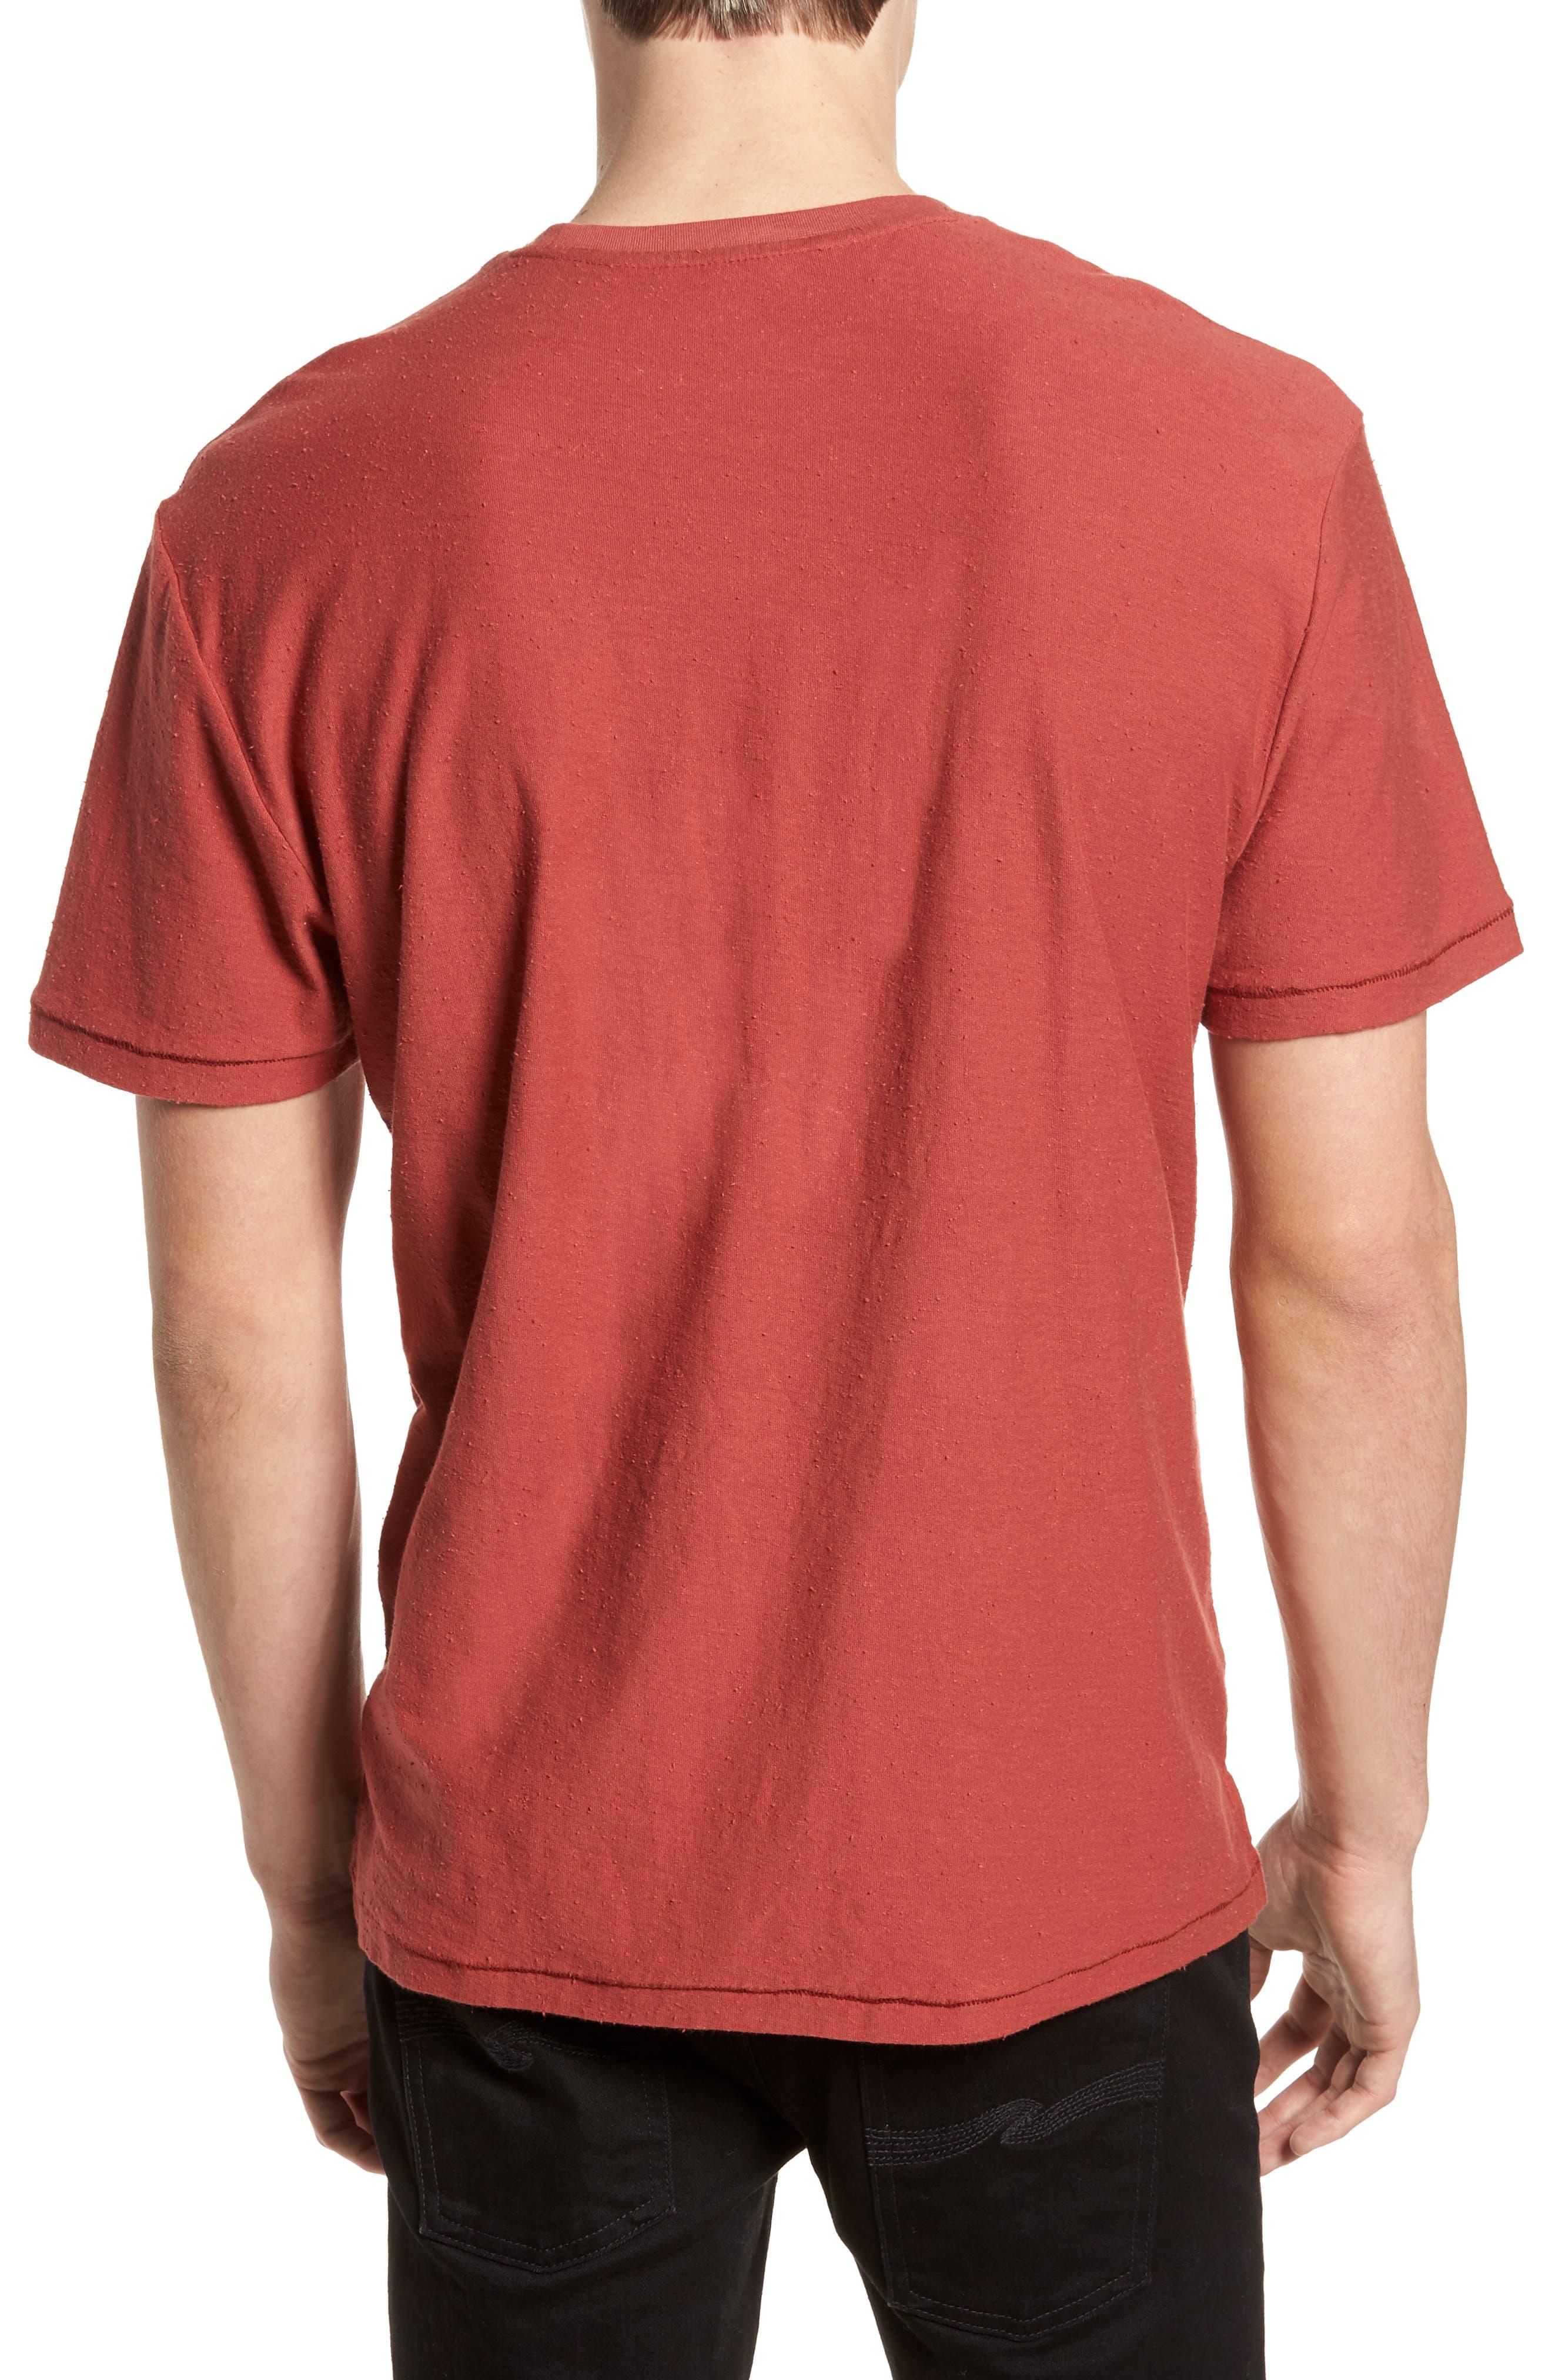 Nep Cotton Pocket T-Shirt,                             Alternate thumbnail 3, color,